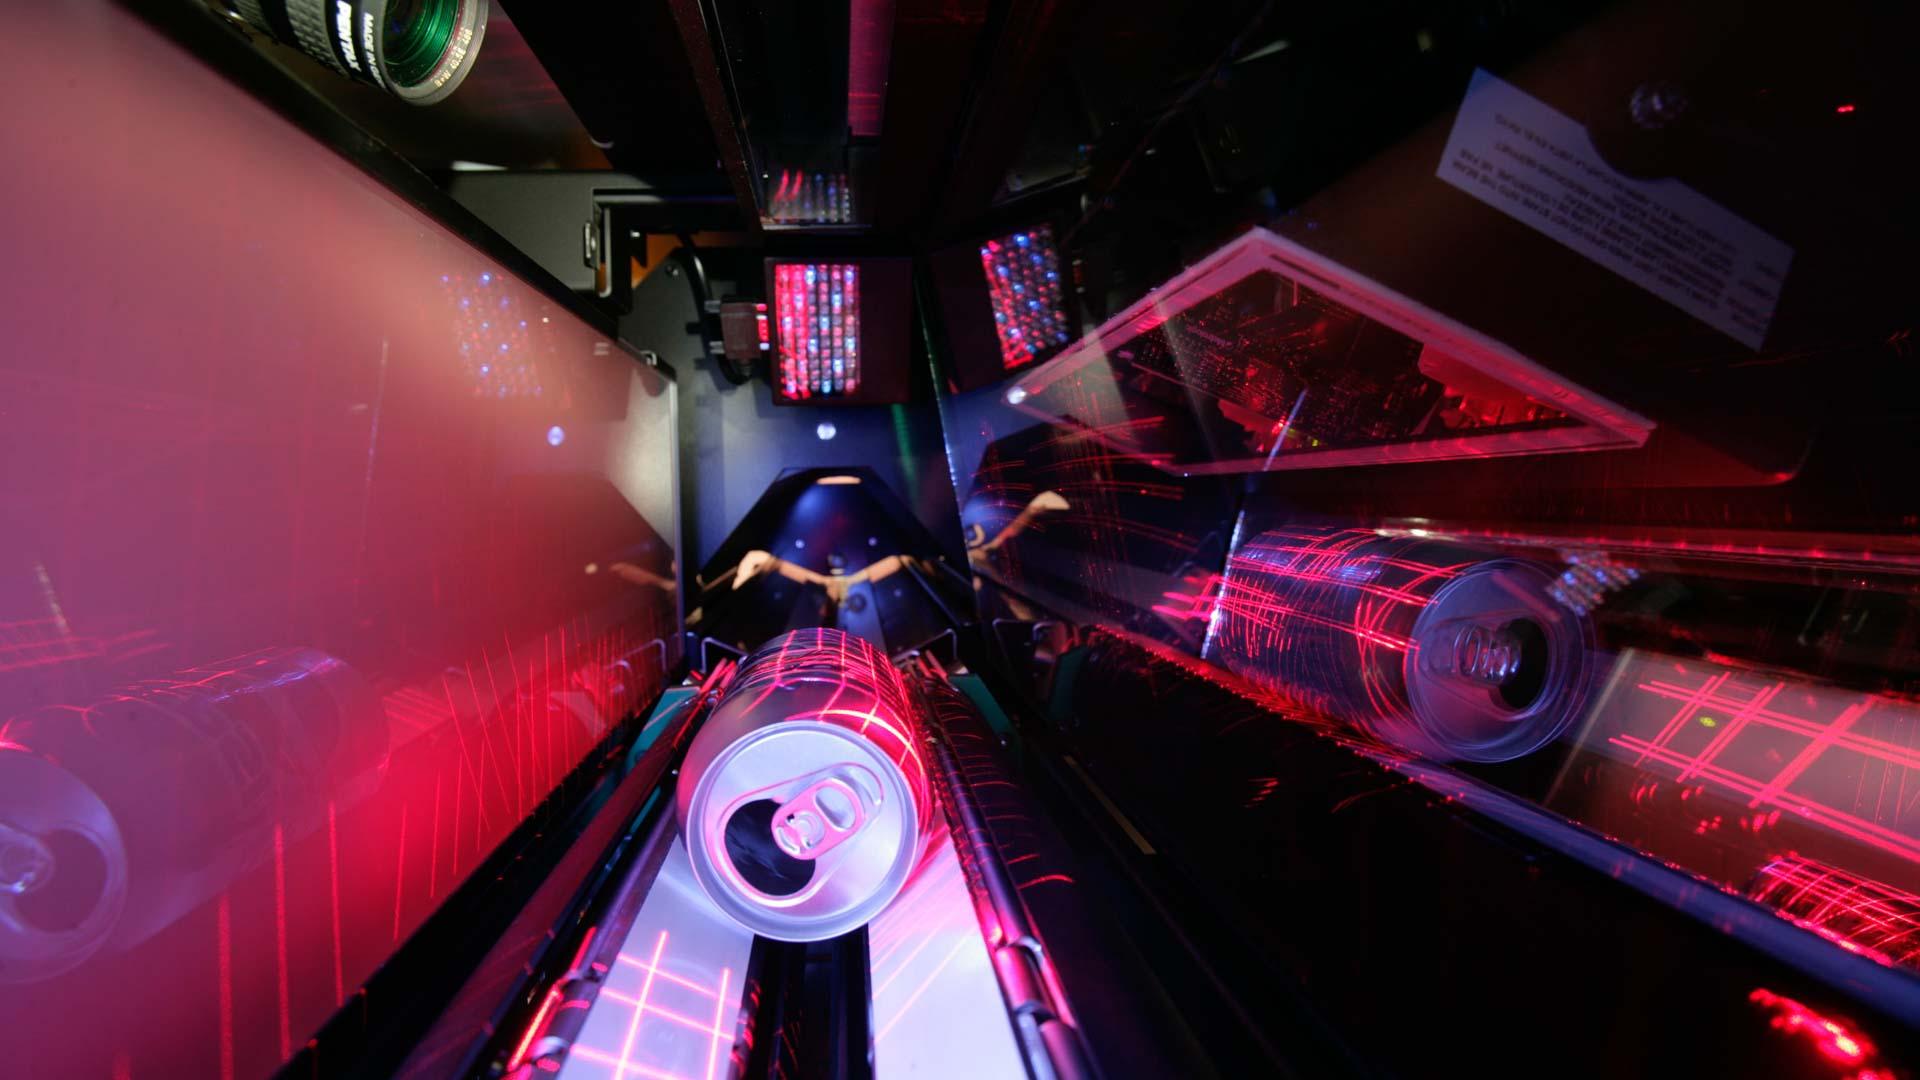 Flaschenrücknahmeautomat REVENDO7000 der Firma Wincor Nixdorf